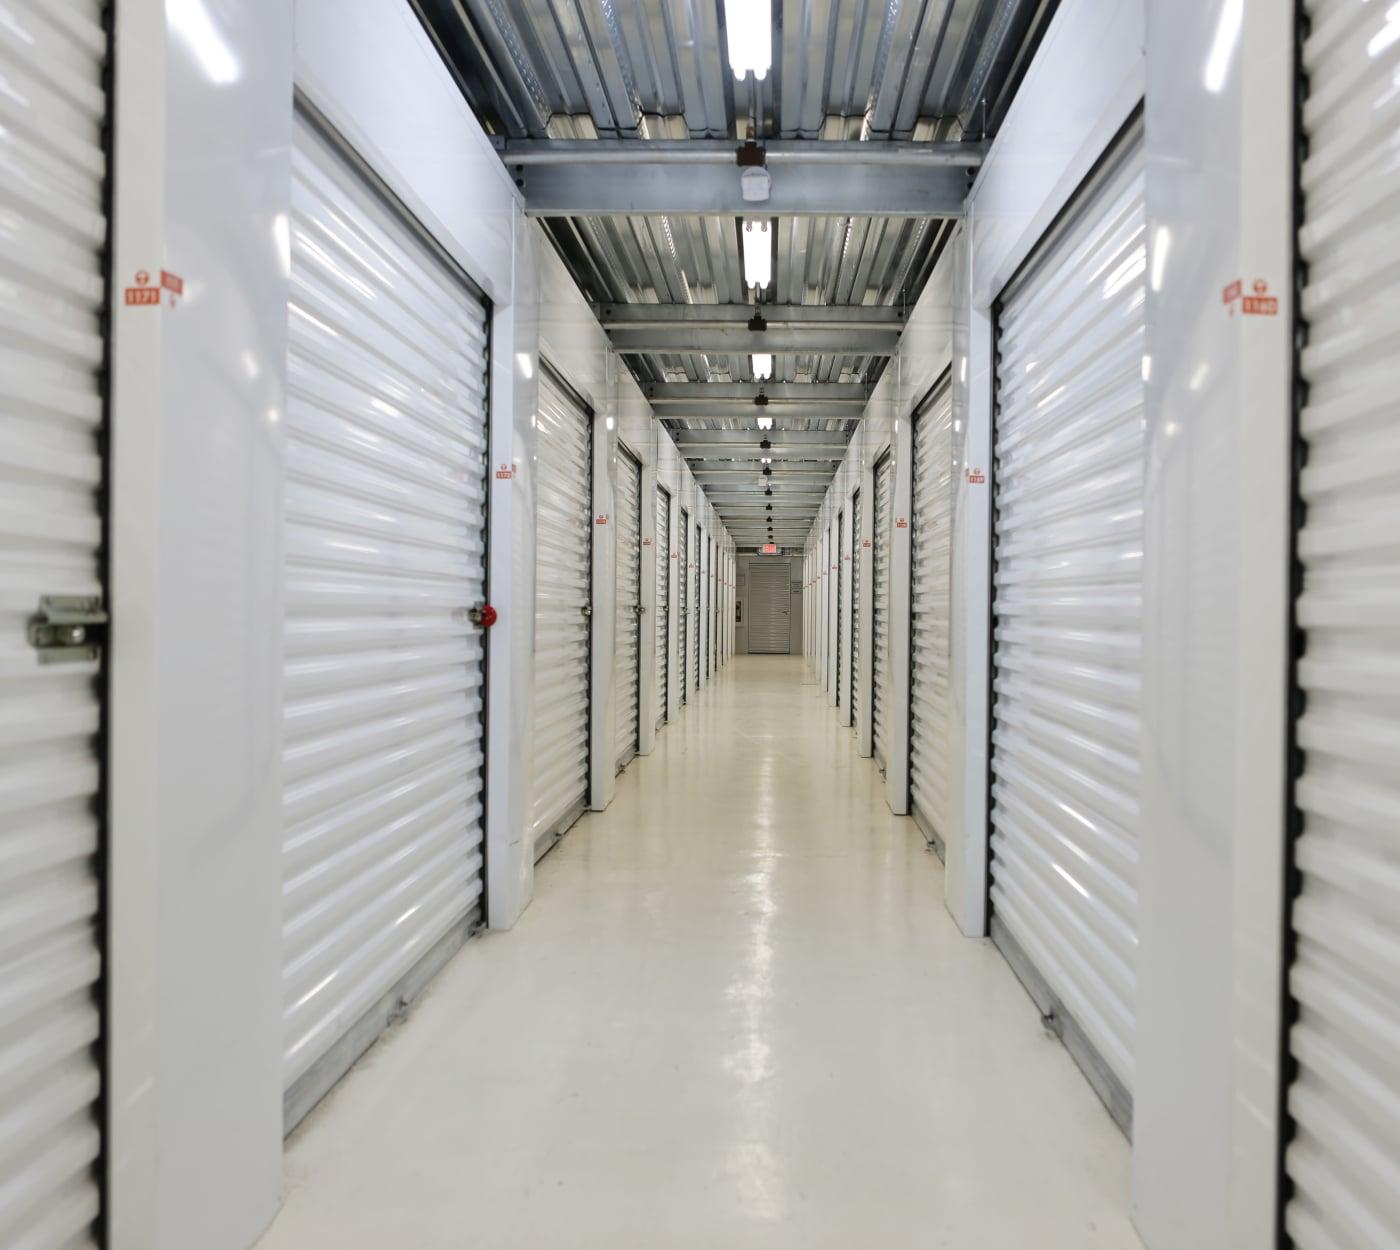 Ground-floor units at Midgard Self Storage in Key West, Florida